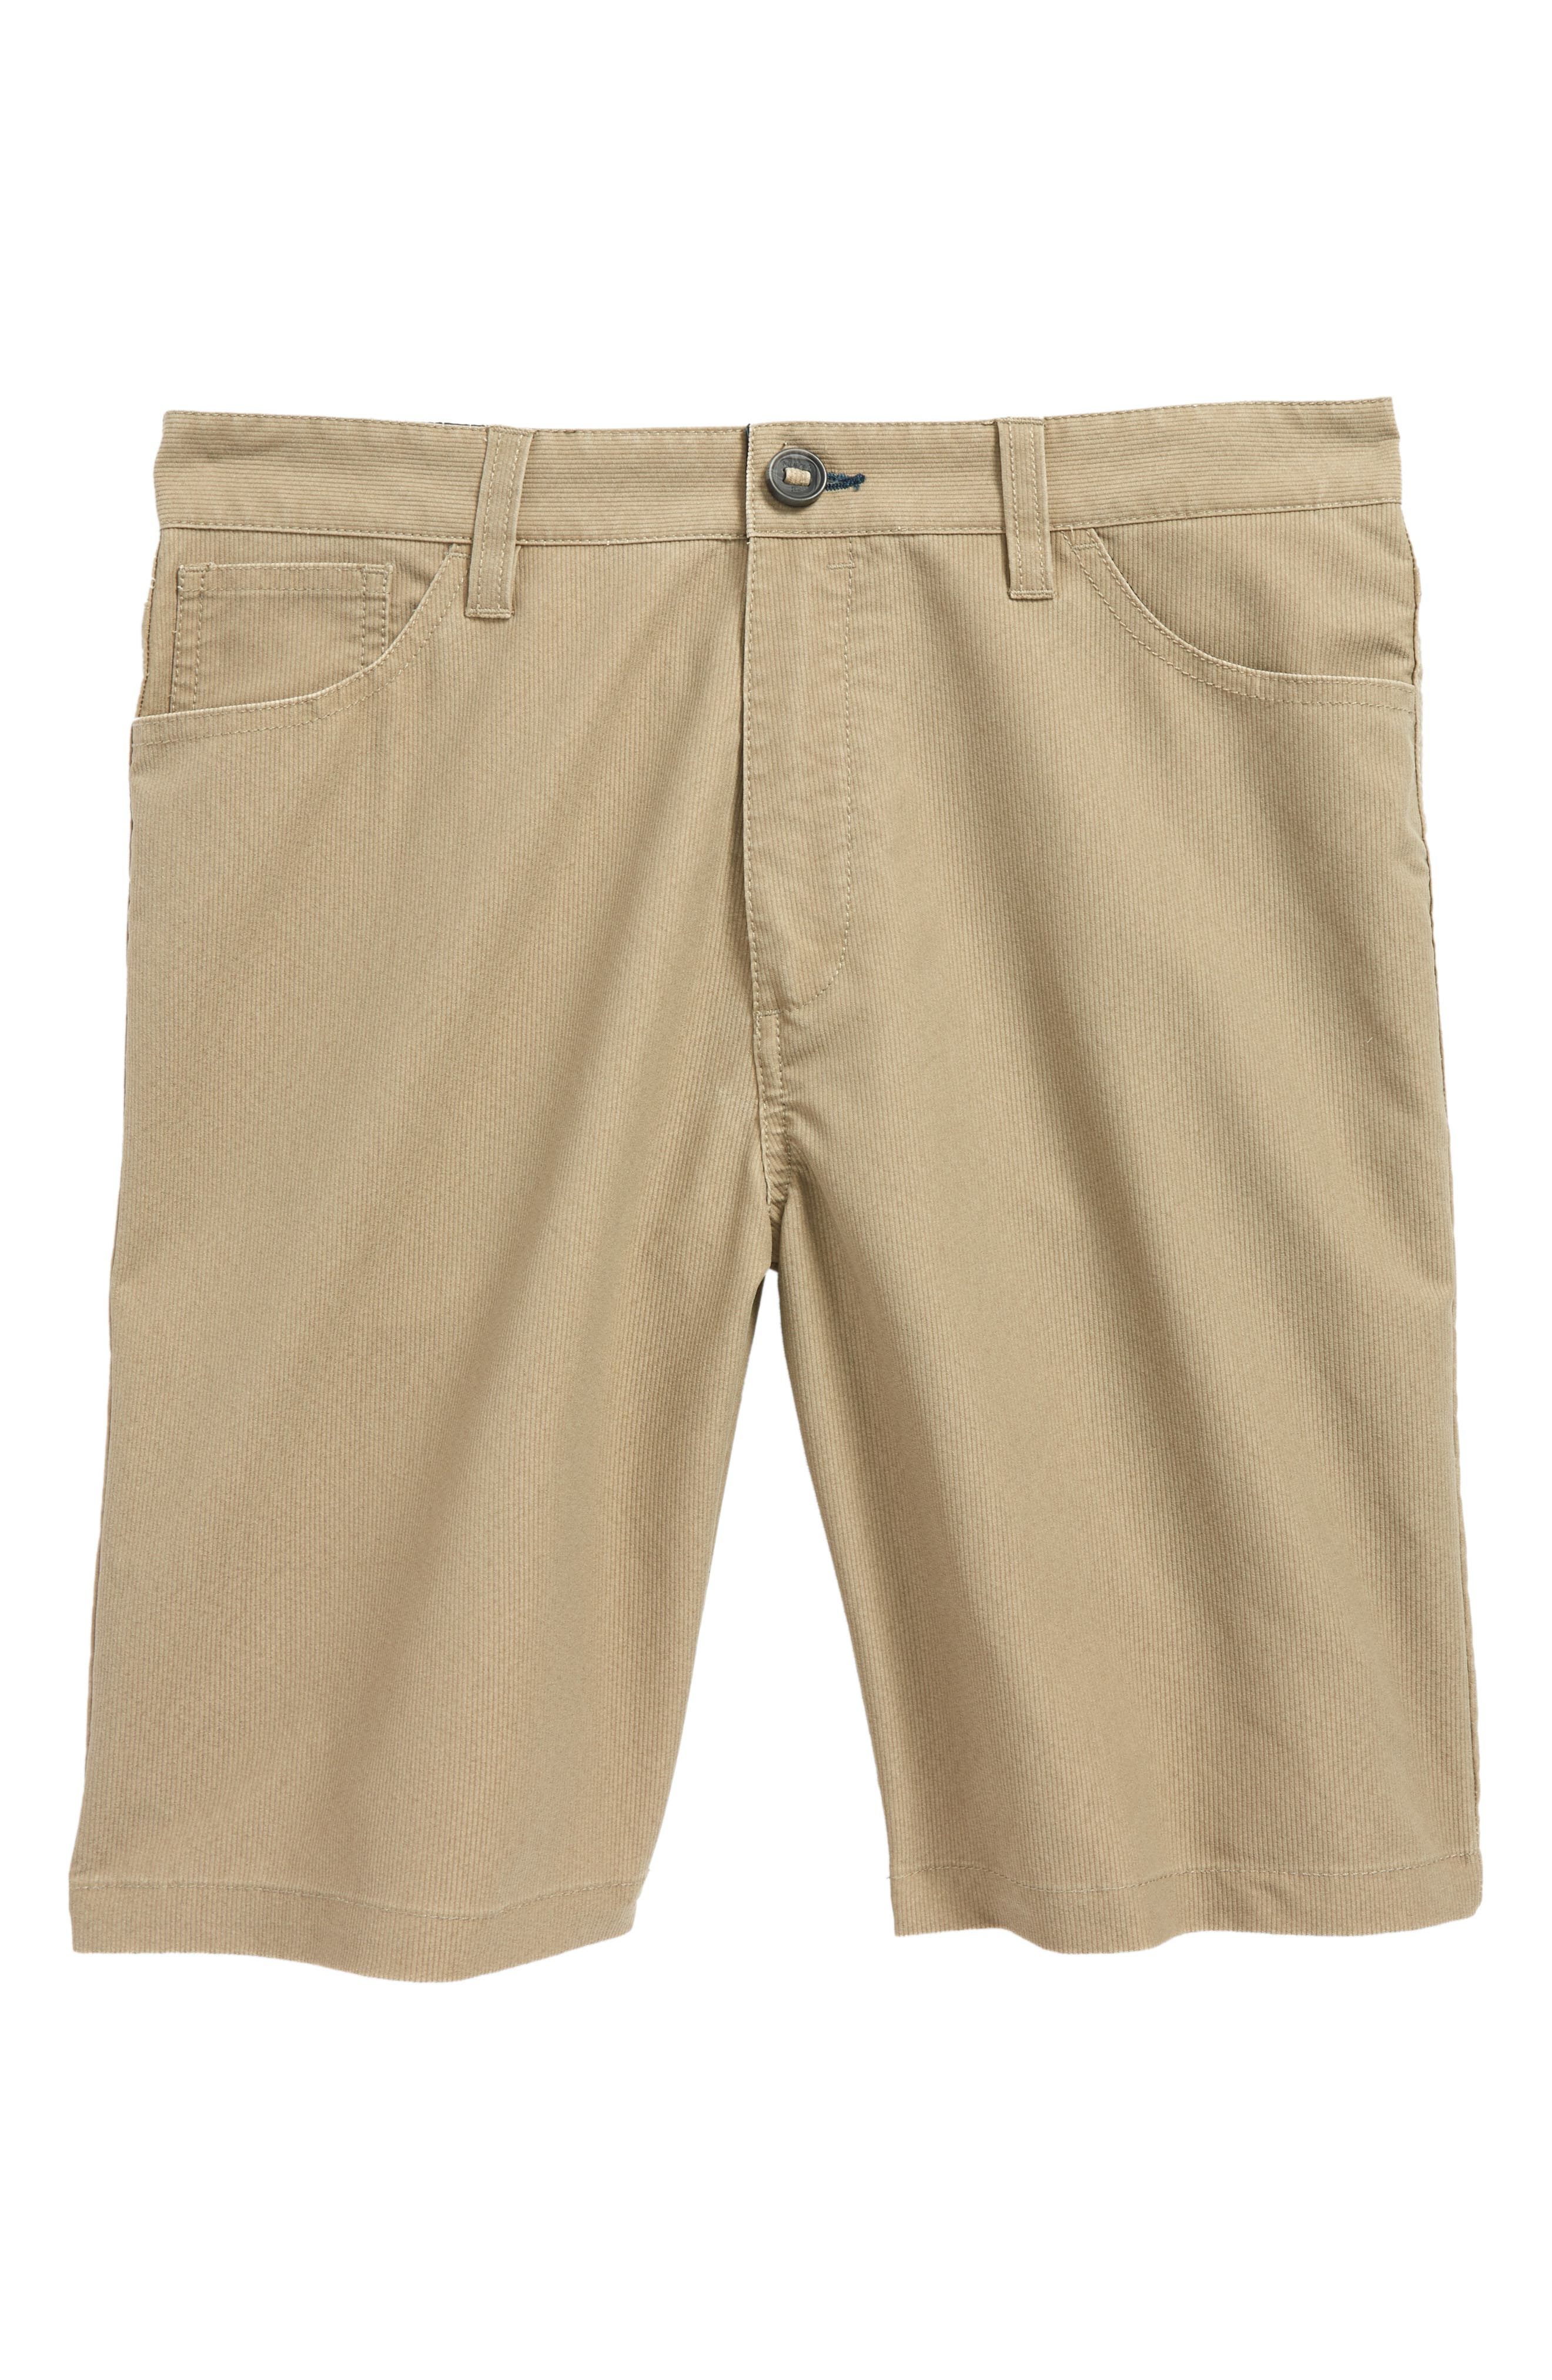 BILLABONG,                             Outsider X Surf Corduroy Hybrid Shorts,                             Main thumbnail 1, color,                             259